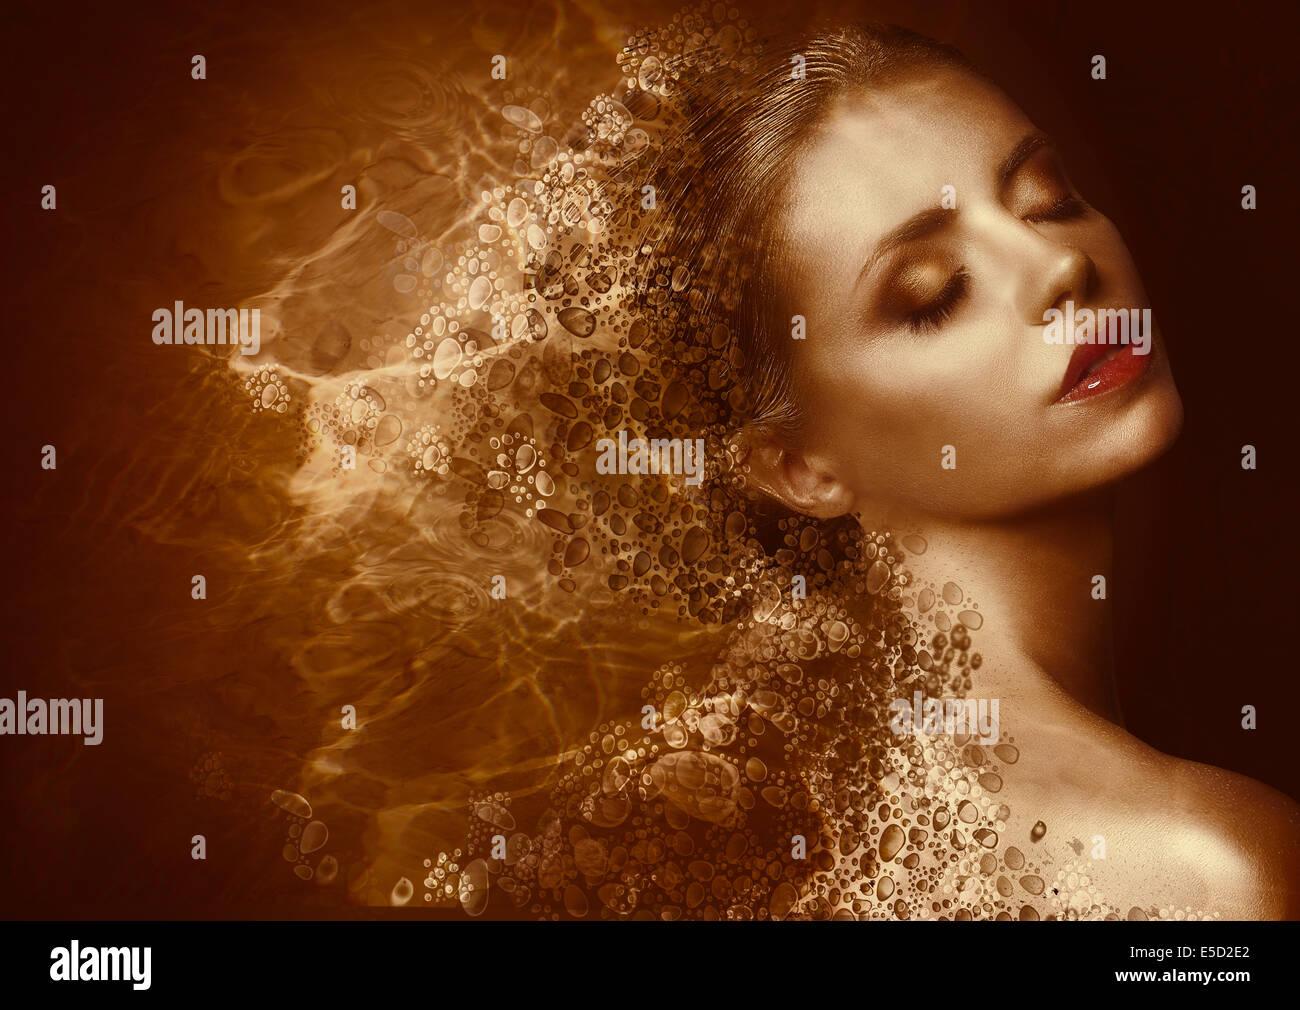 Goldene Splatter. Futuristische Frau mit gebräunten bemalte Haut. Fantasie Stockbild